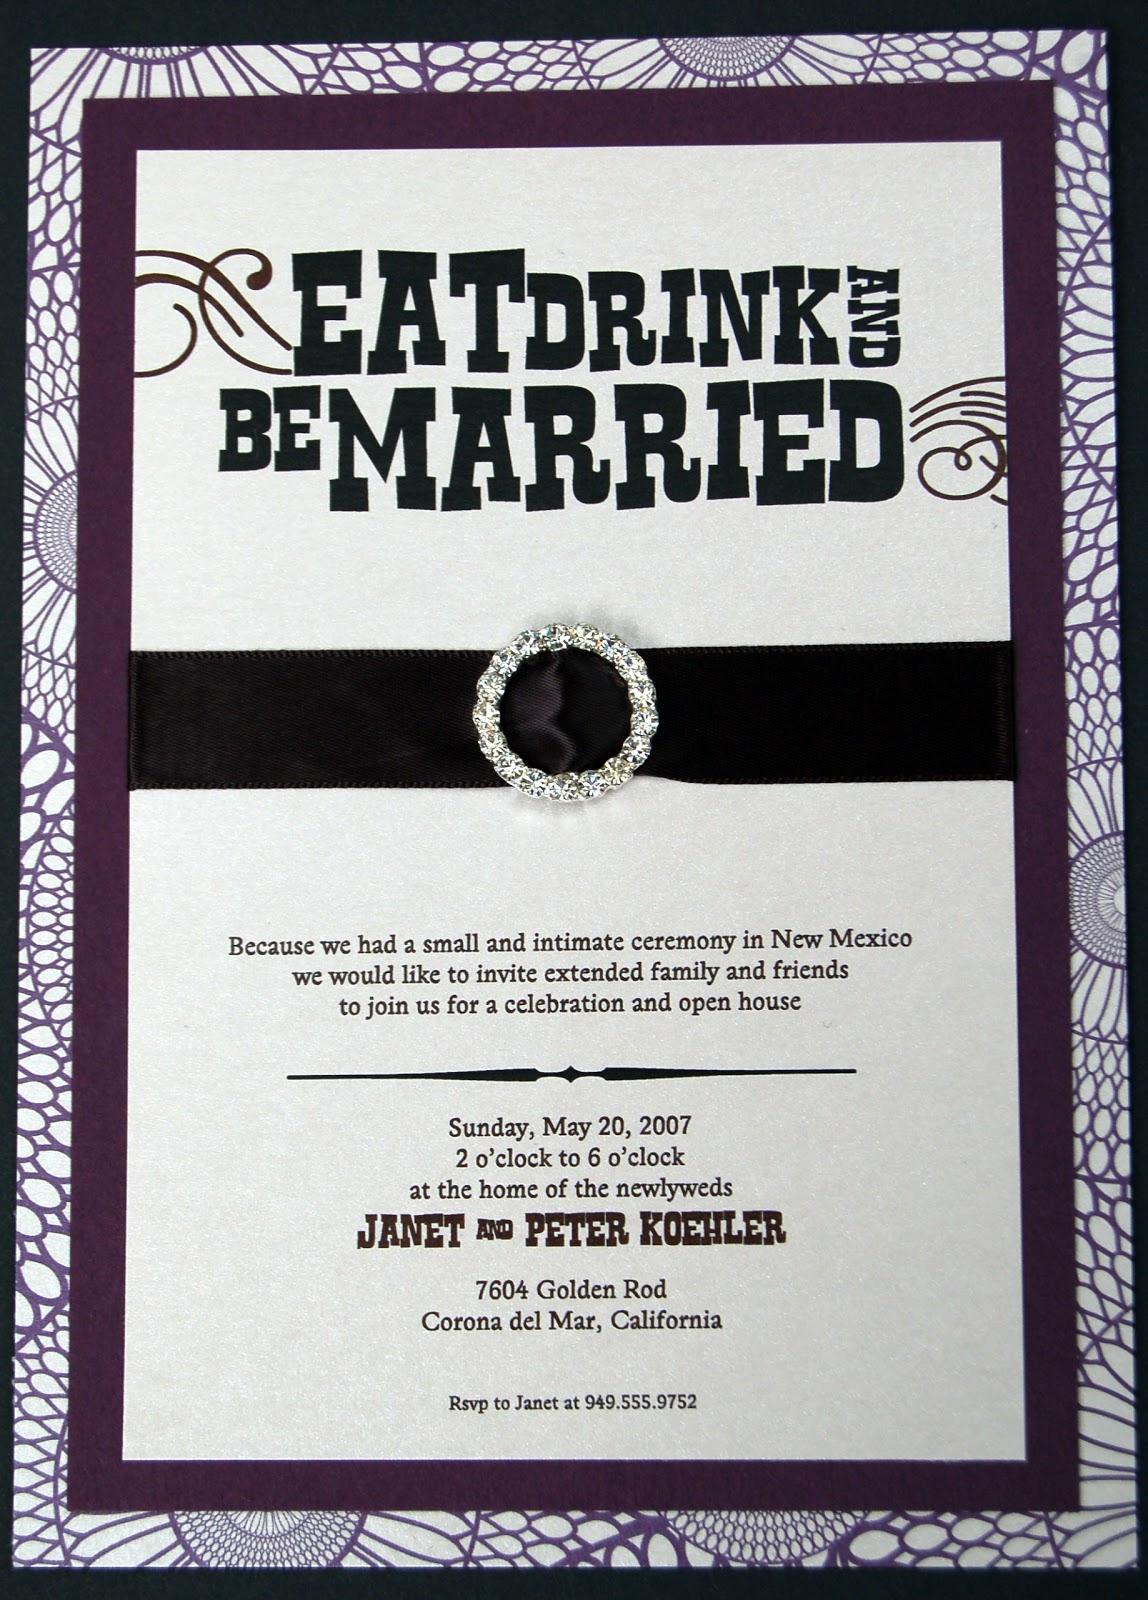 Post Wedding Open House Invitation Wording Poemdocor